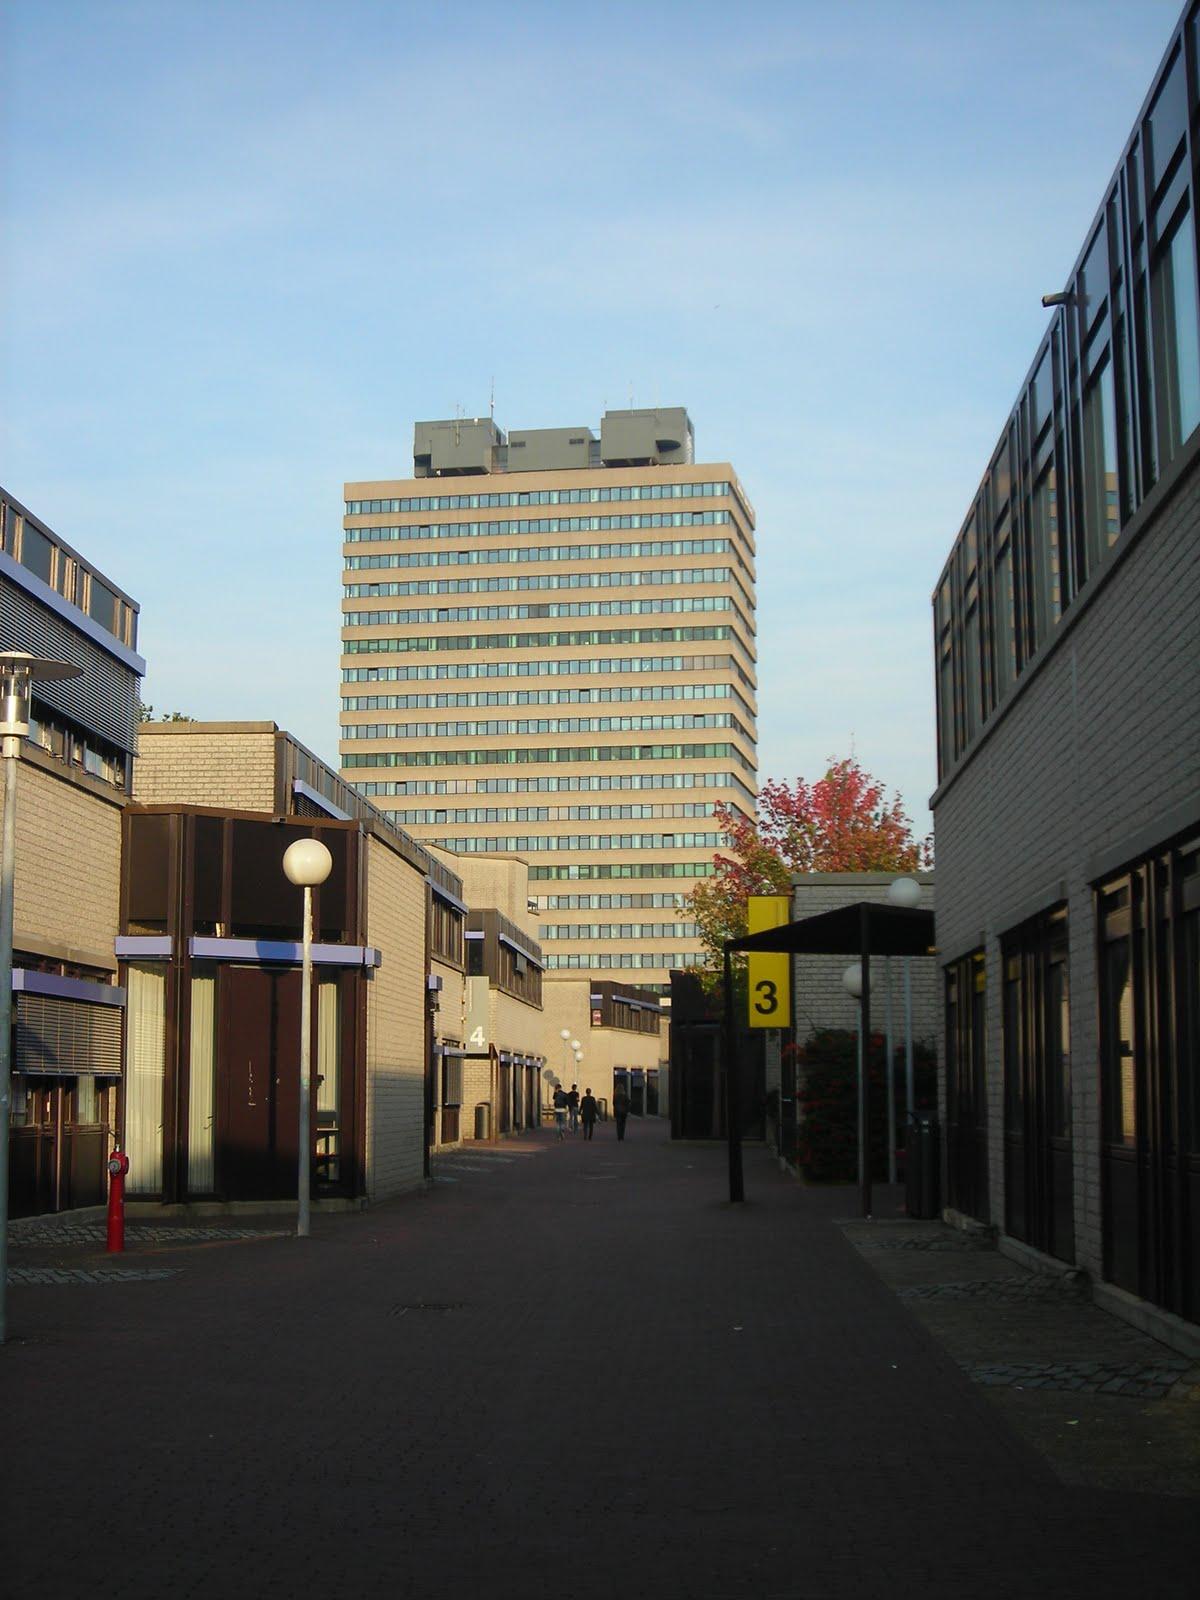 germ@namur: Recollections of Nijmegen   1200 x 1600 jpeg 191kB